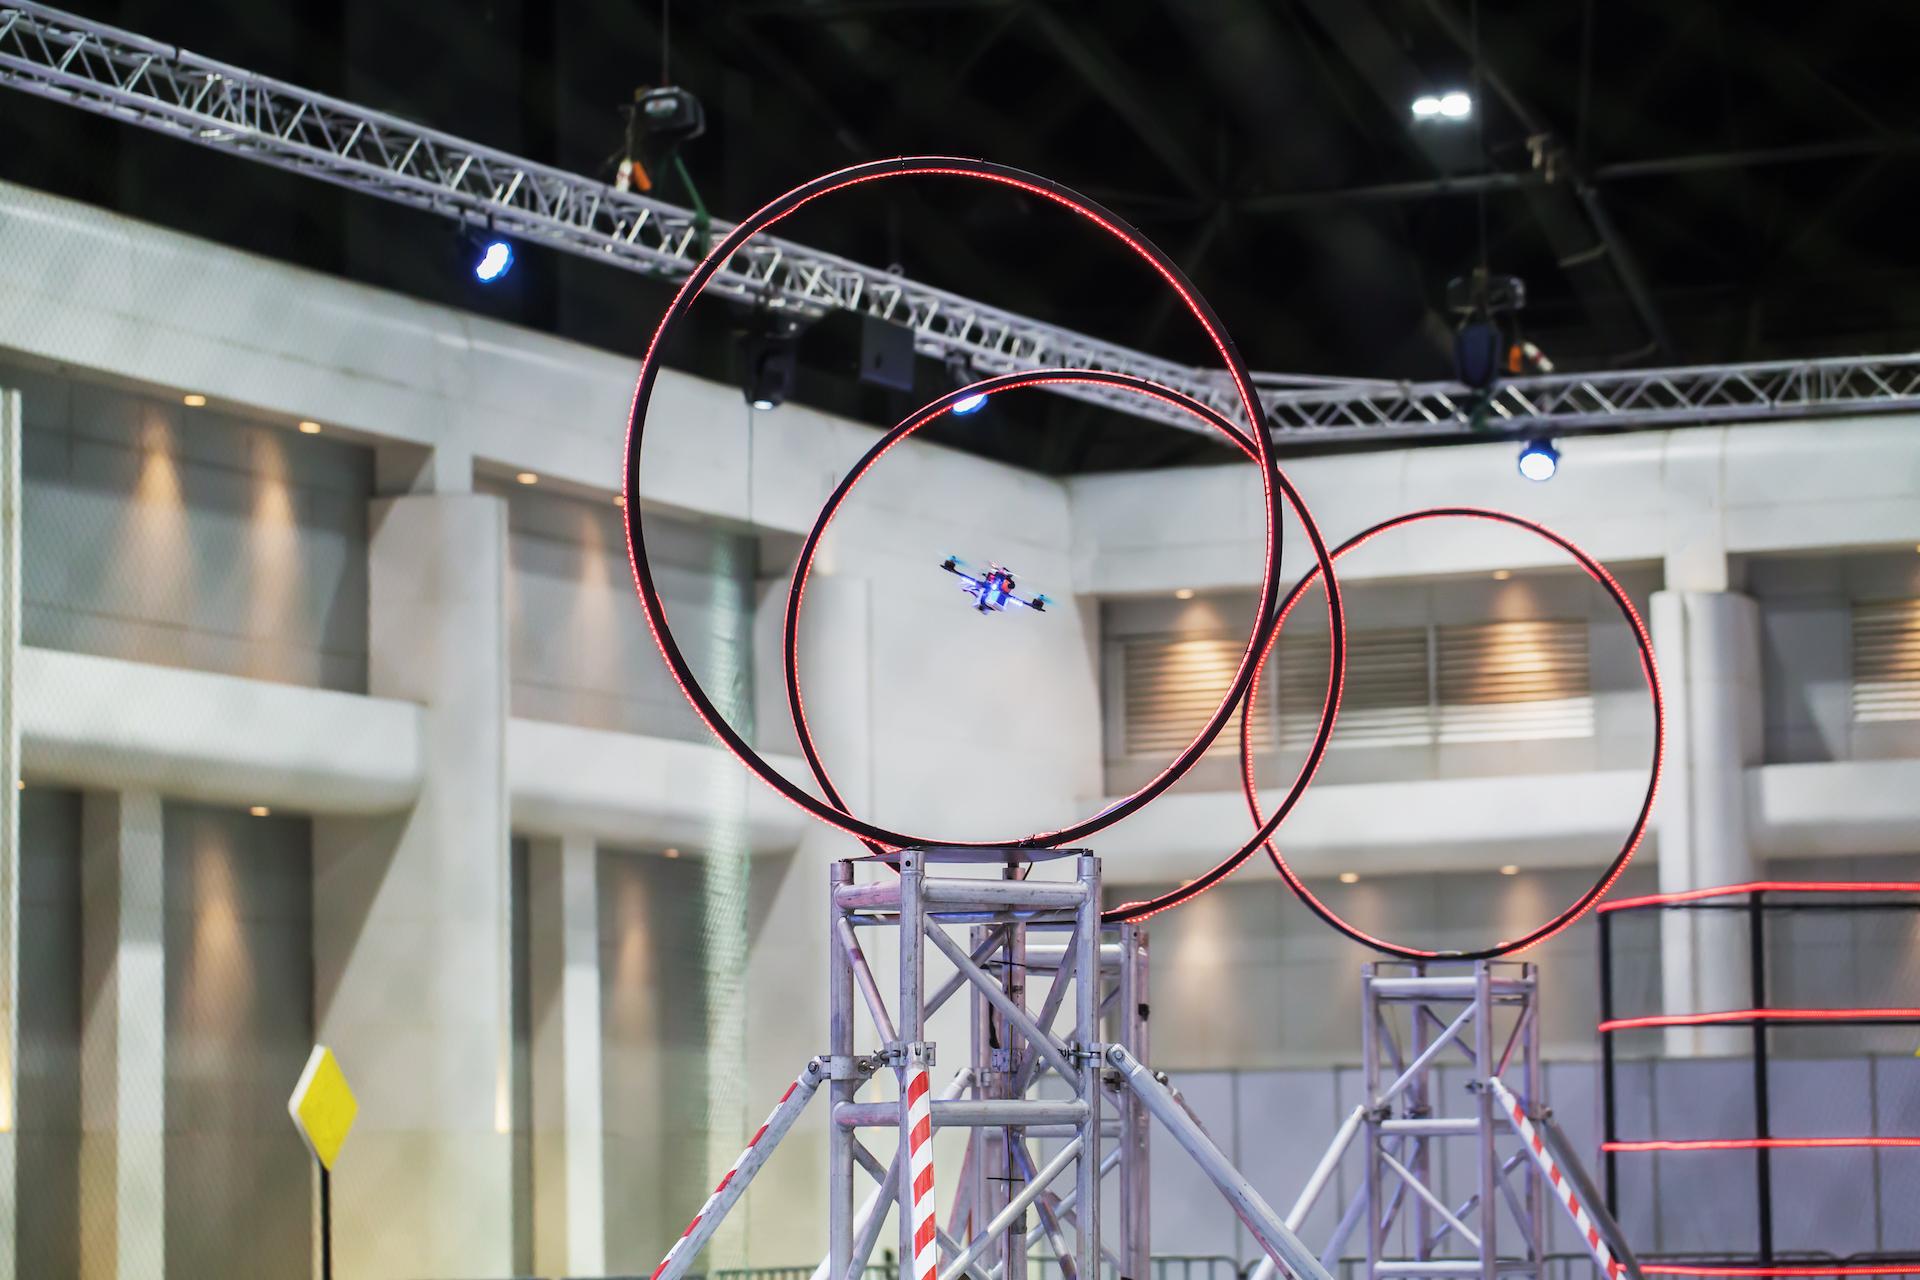 HKDSA:《小型無人機令》無視競速無人機運動需求 扼殺發展空間